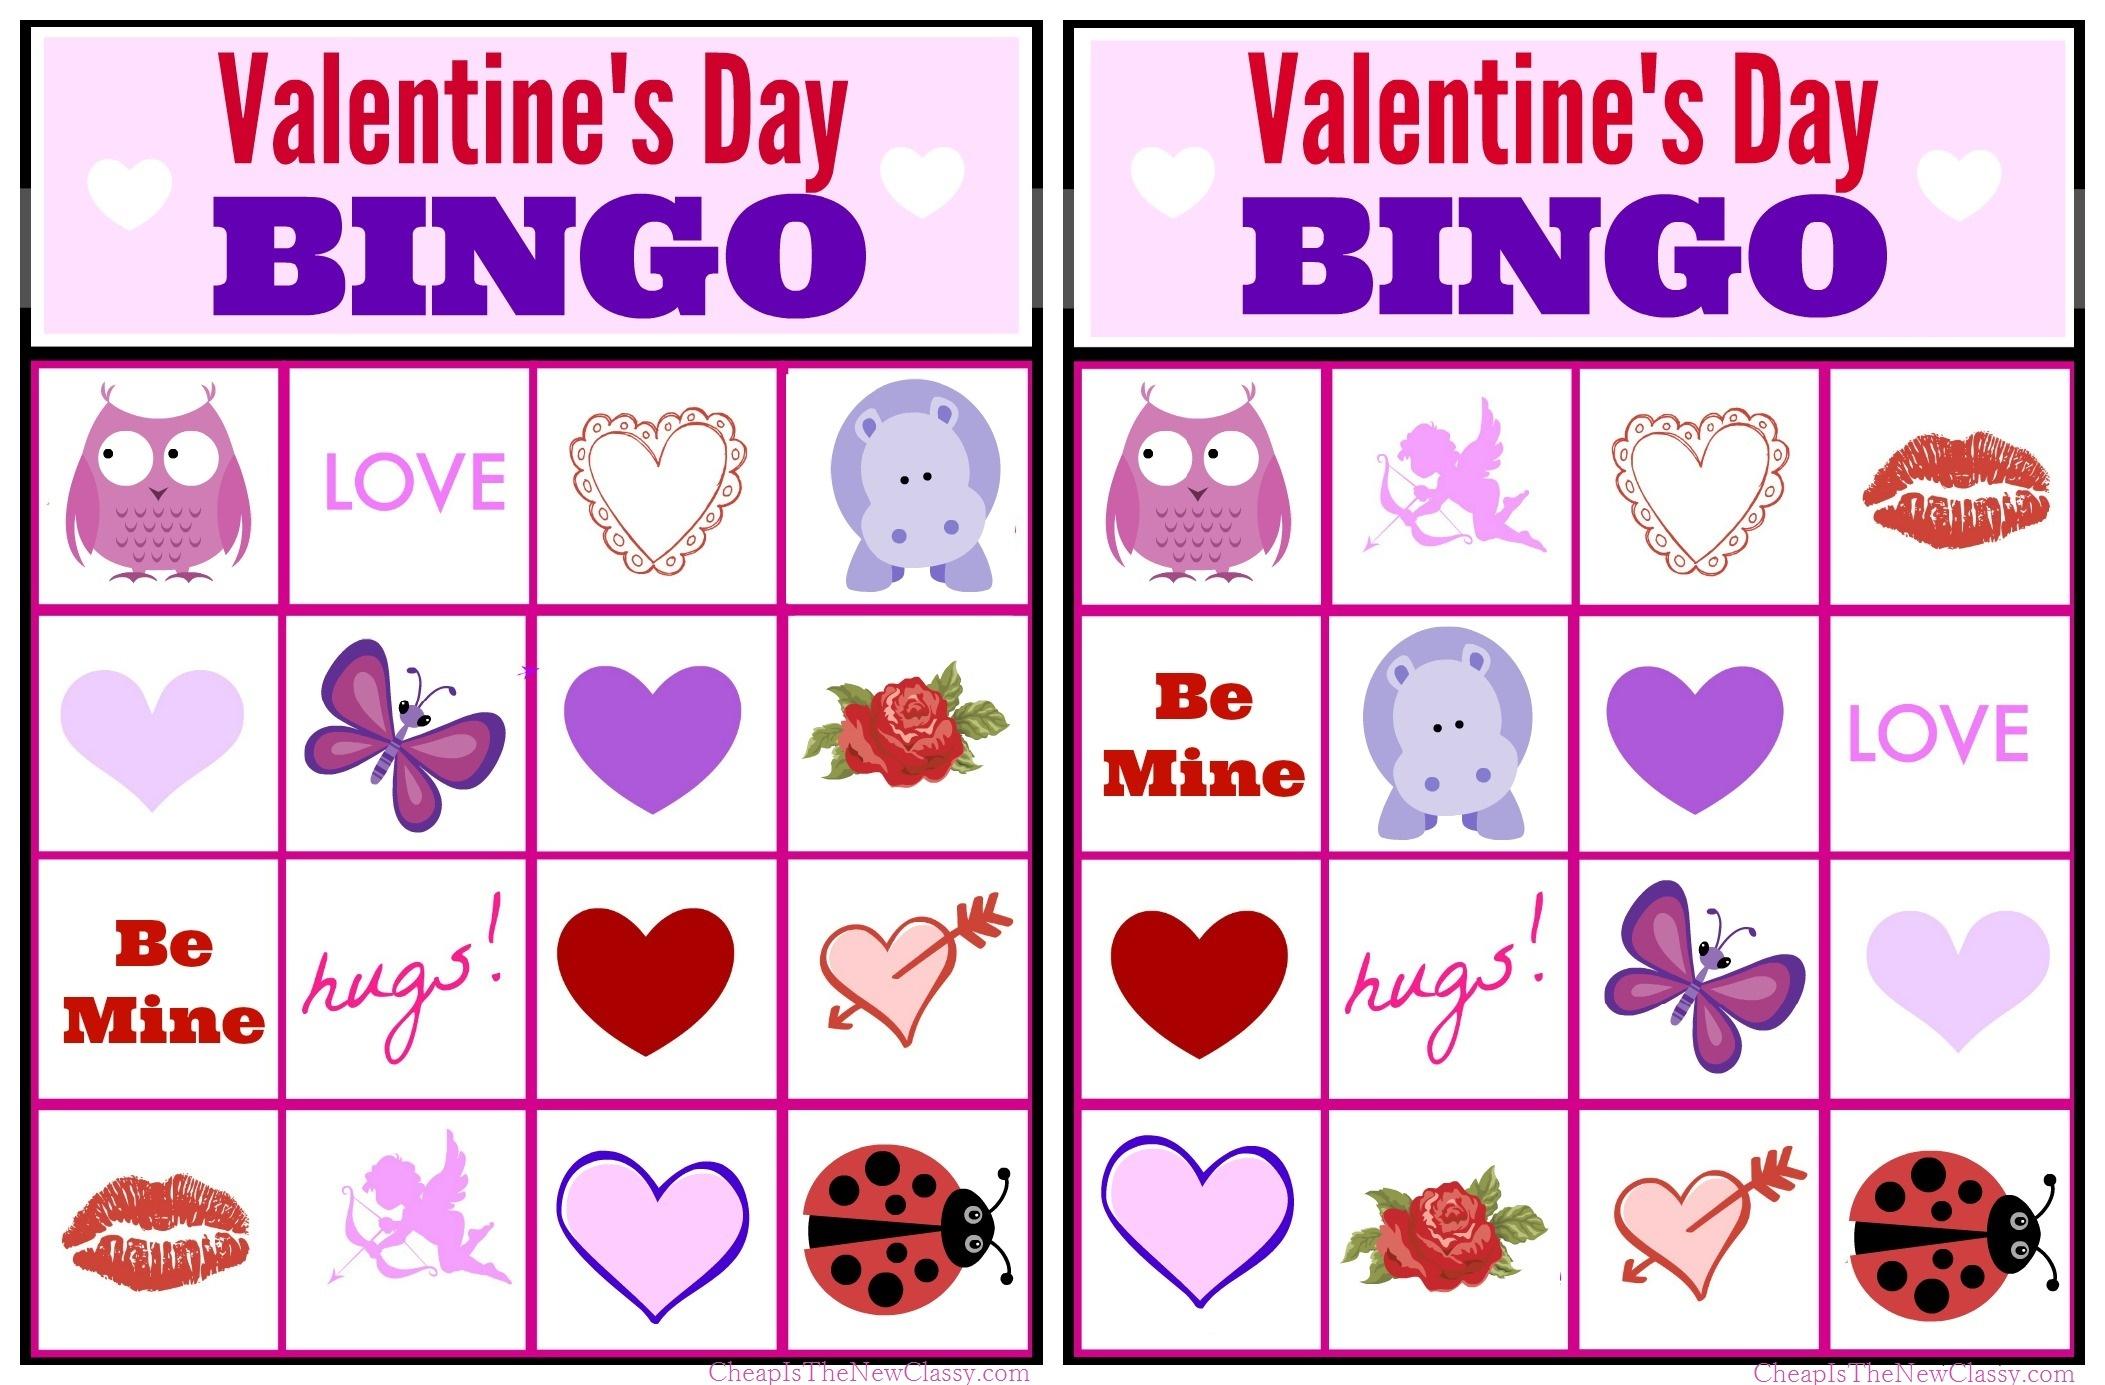 Free Valentine Bingo Game Printable Collection For Kids - Free Printable Valentine Game